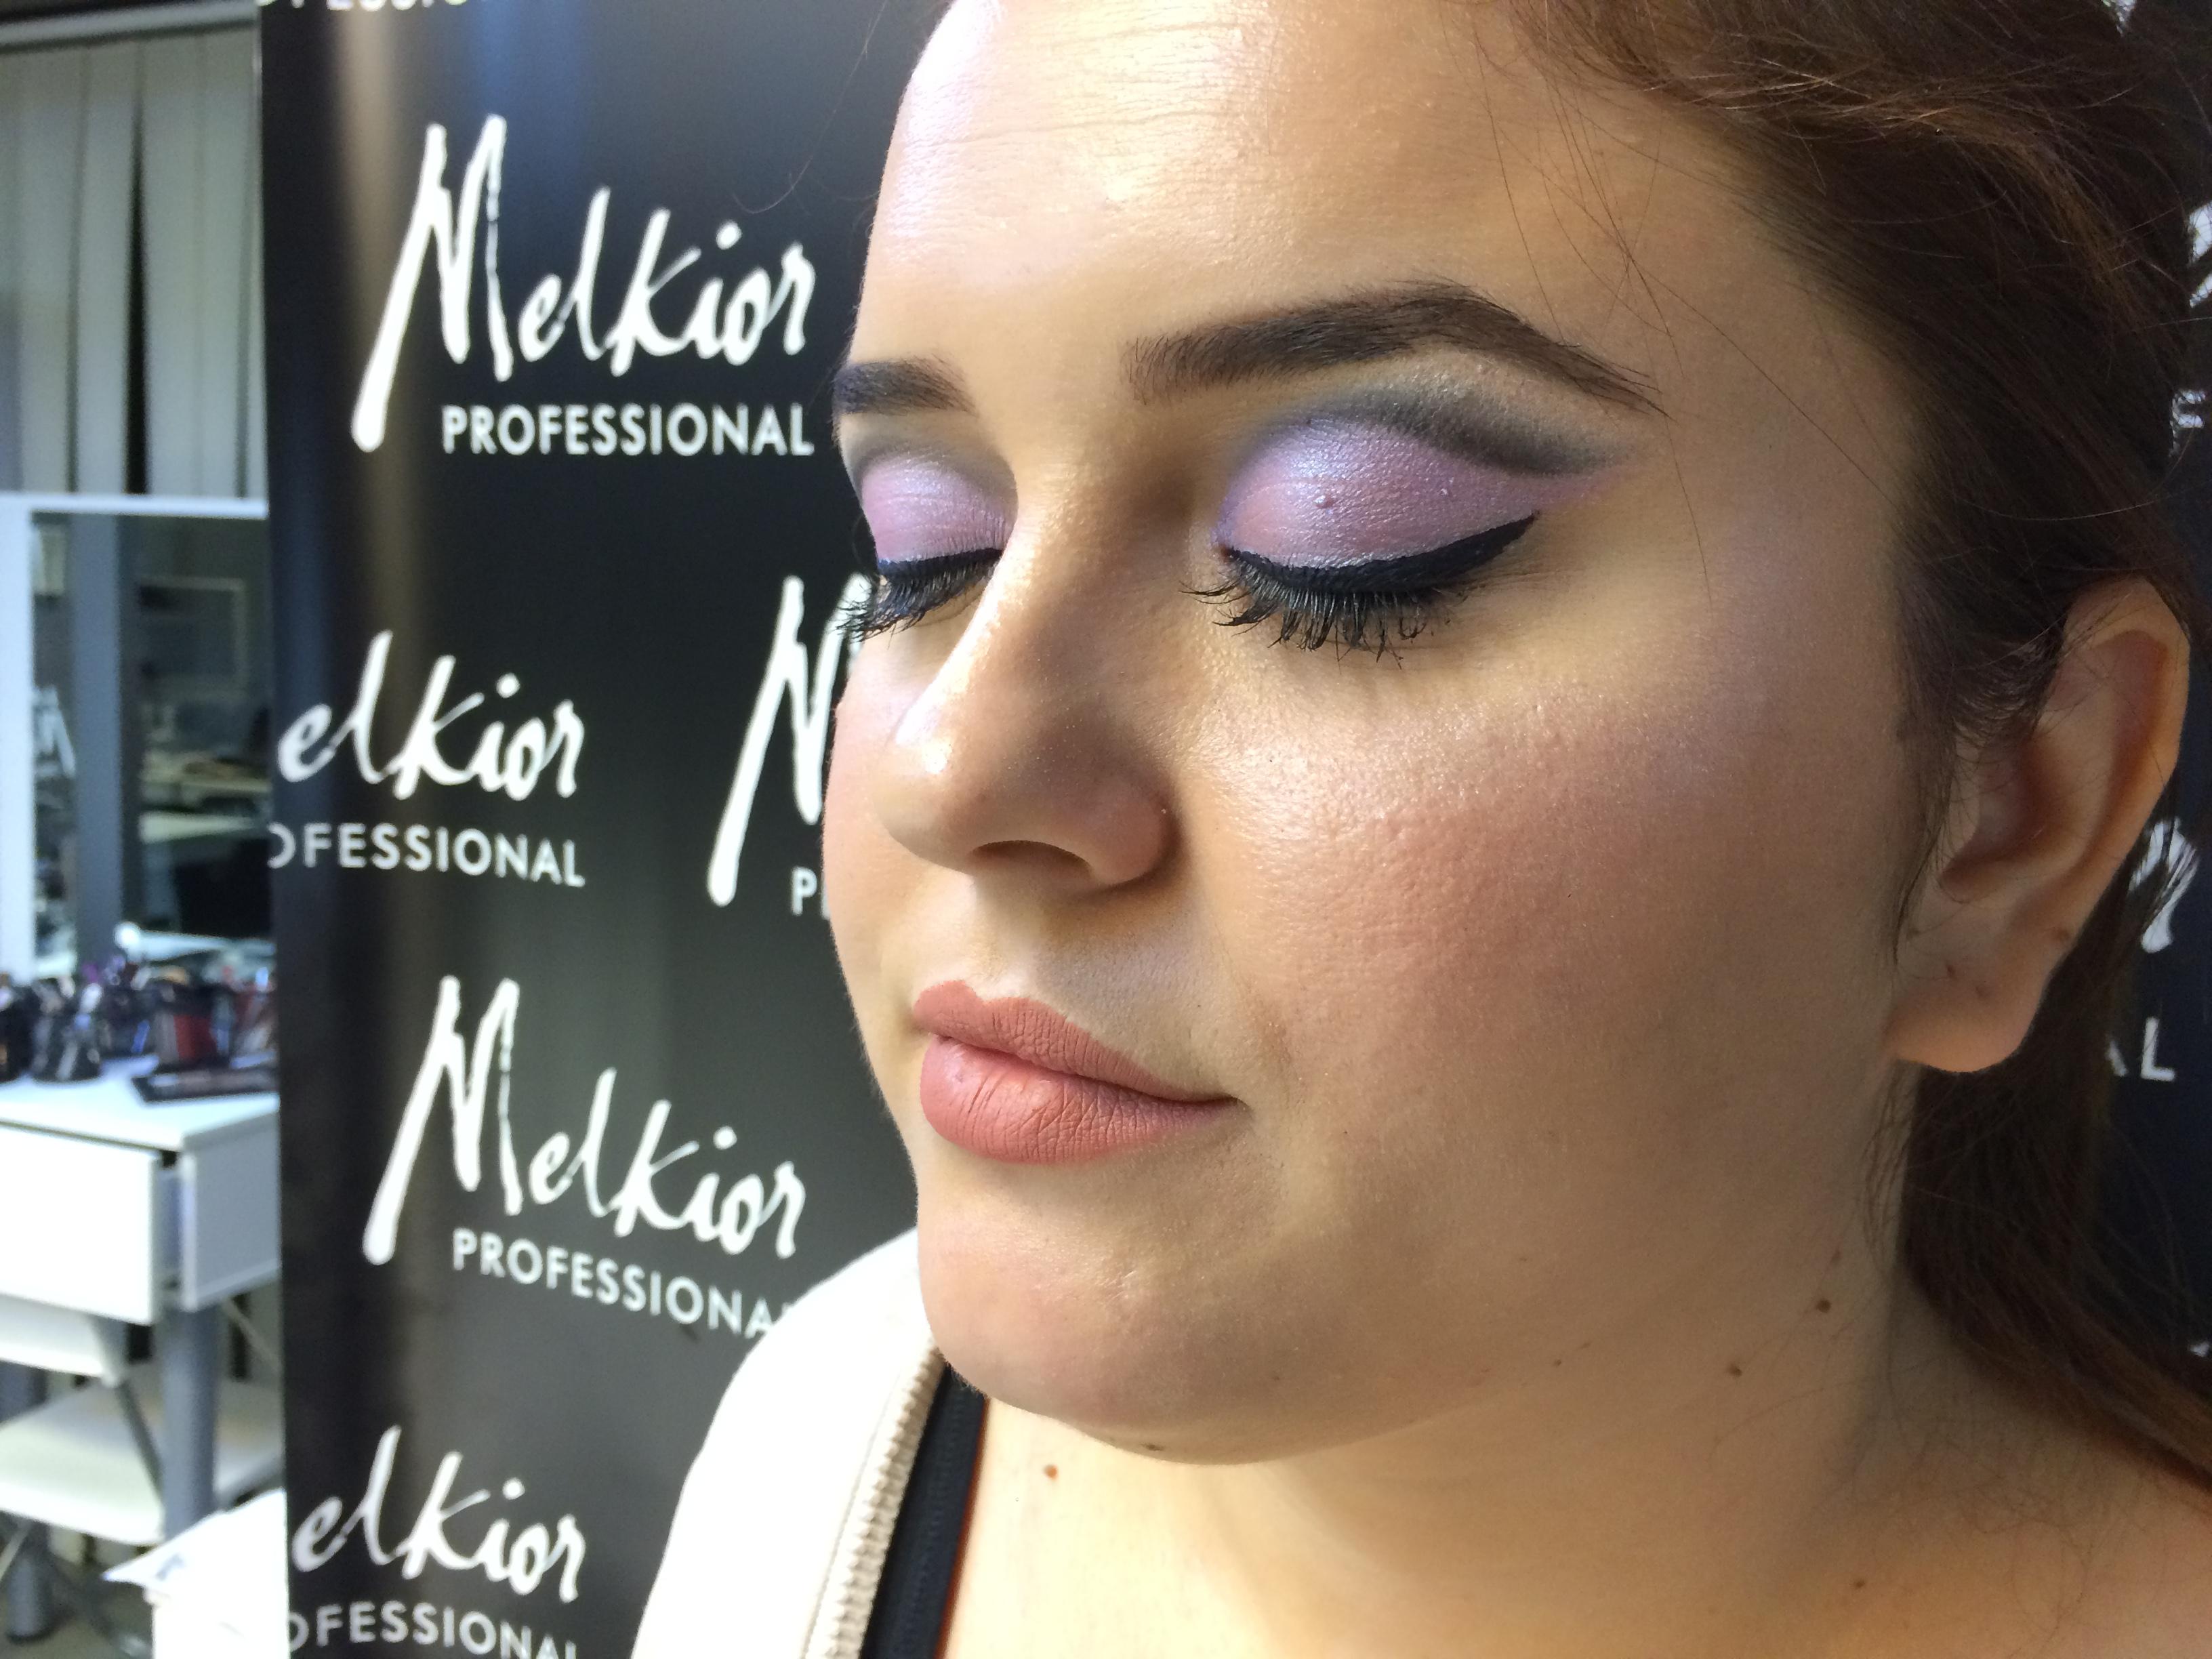 Scoala De Makeup Melkior